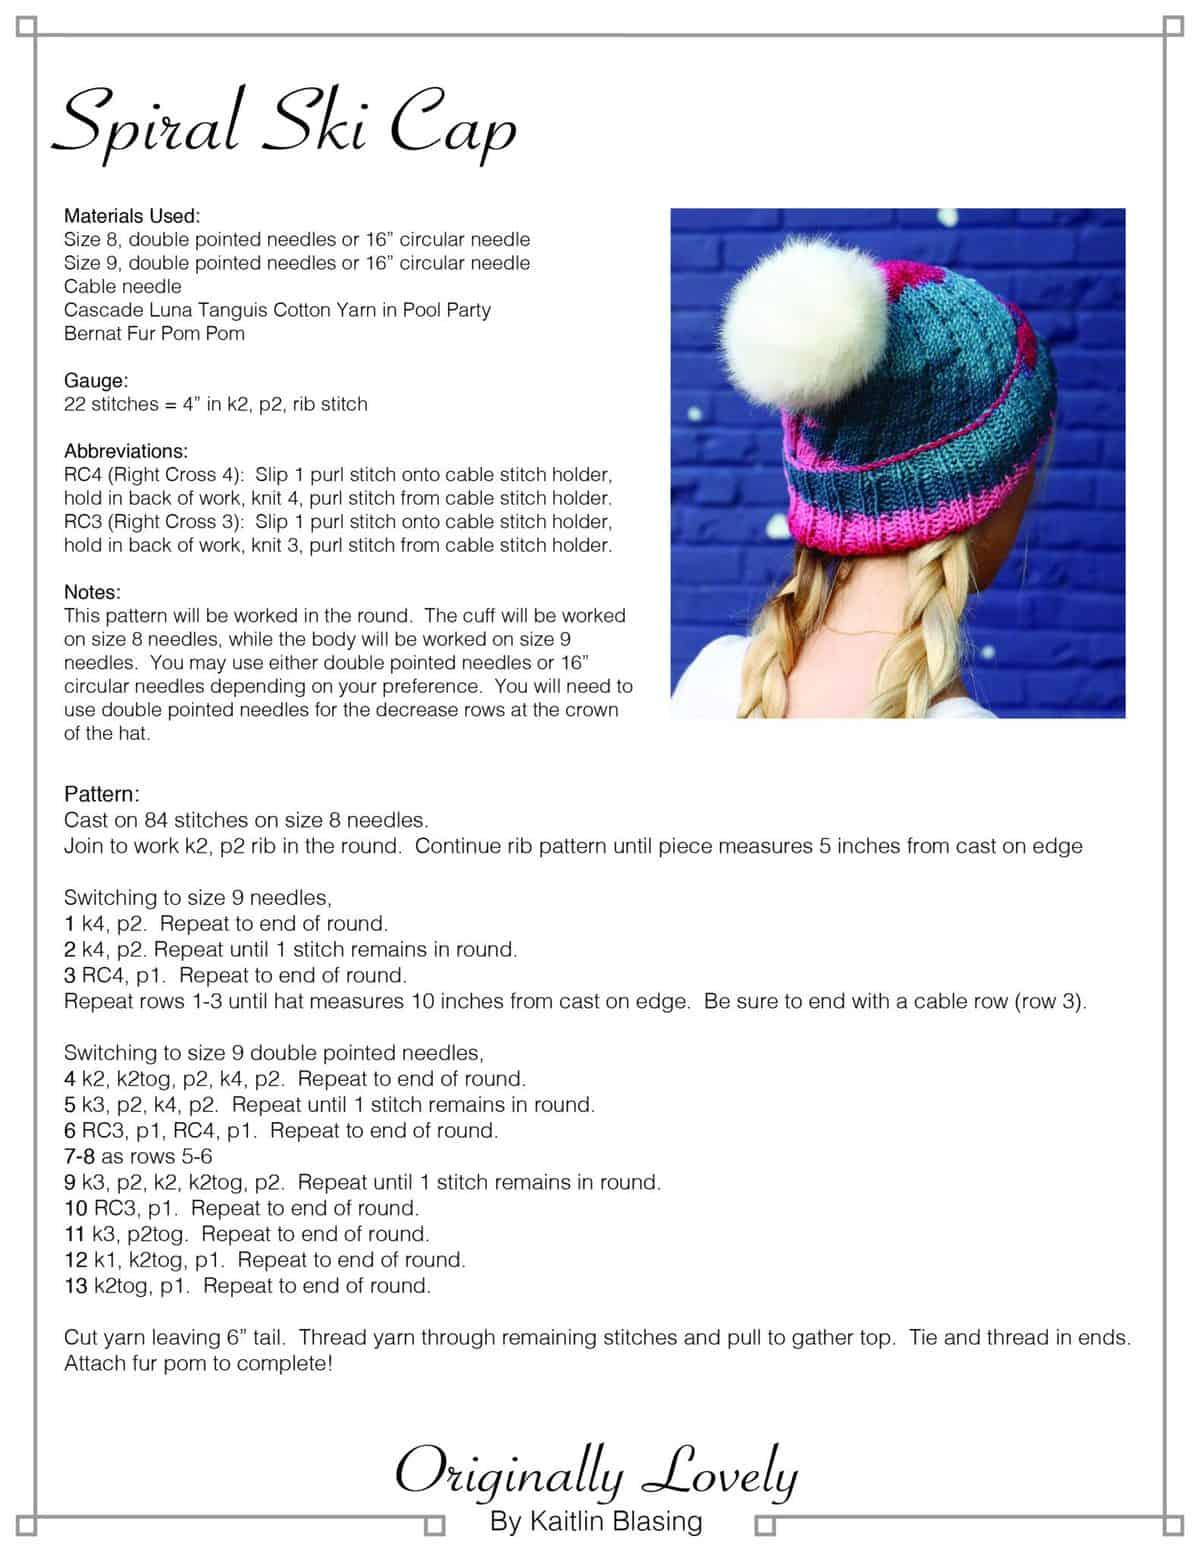 Spiral Ski Cap | Originally Lovely